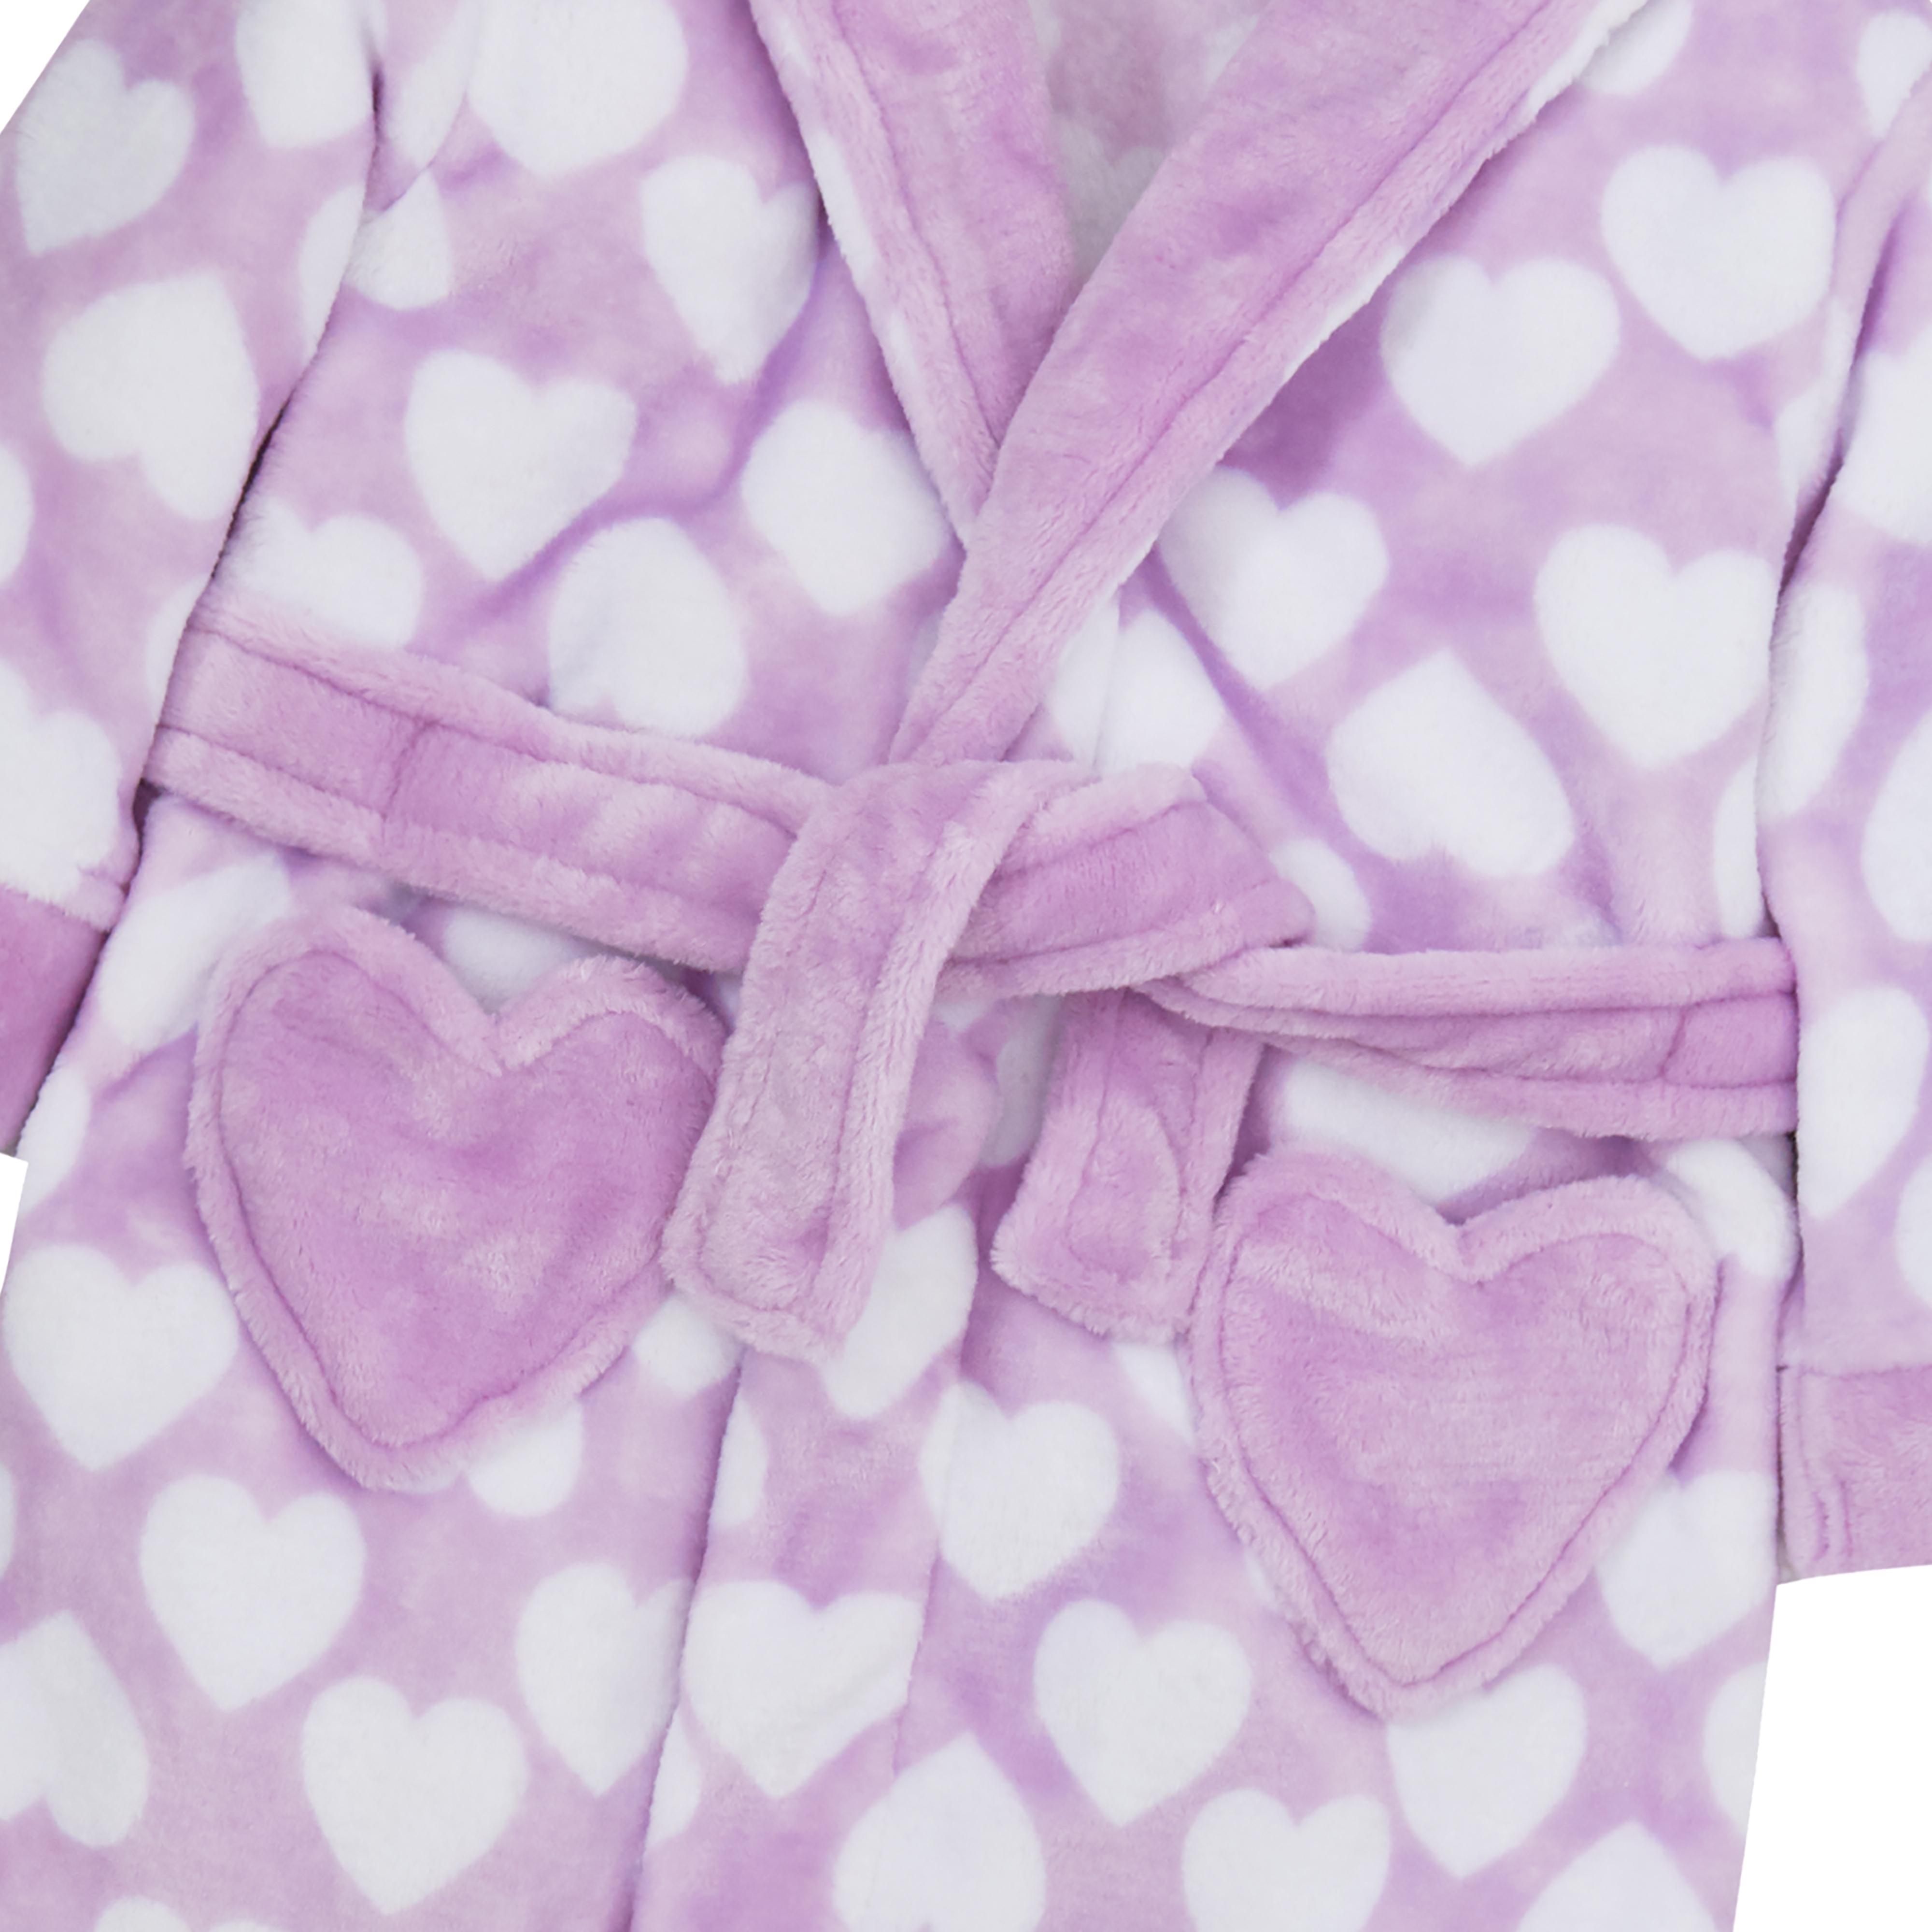 Kids Childrens Girls Boys Dressing Gown Fleece Hooded Robe Bath Robe Free Gift